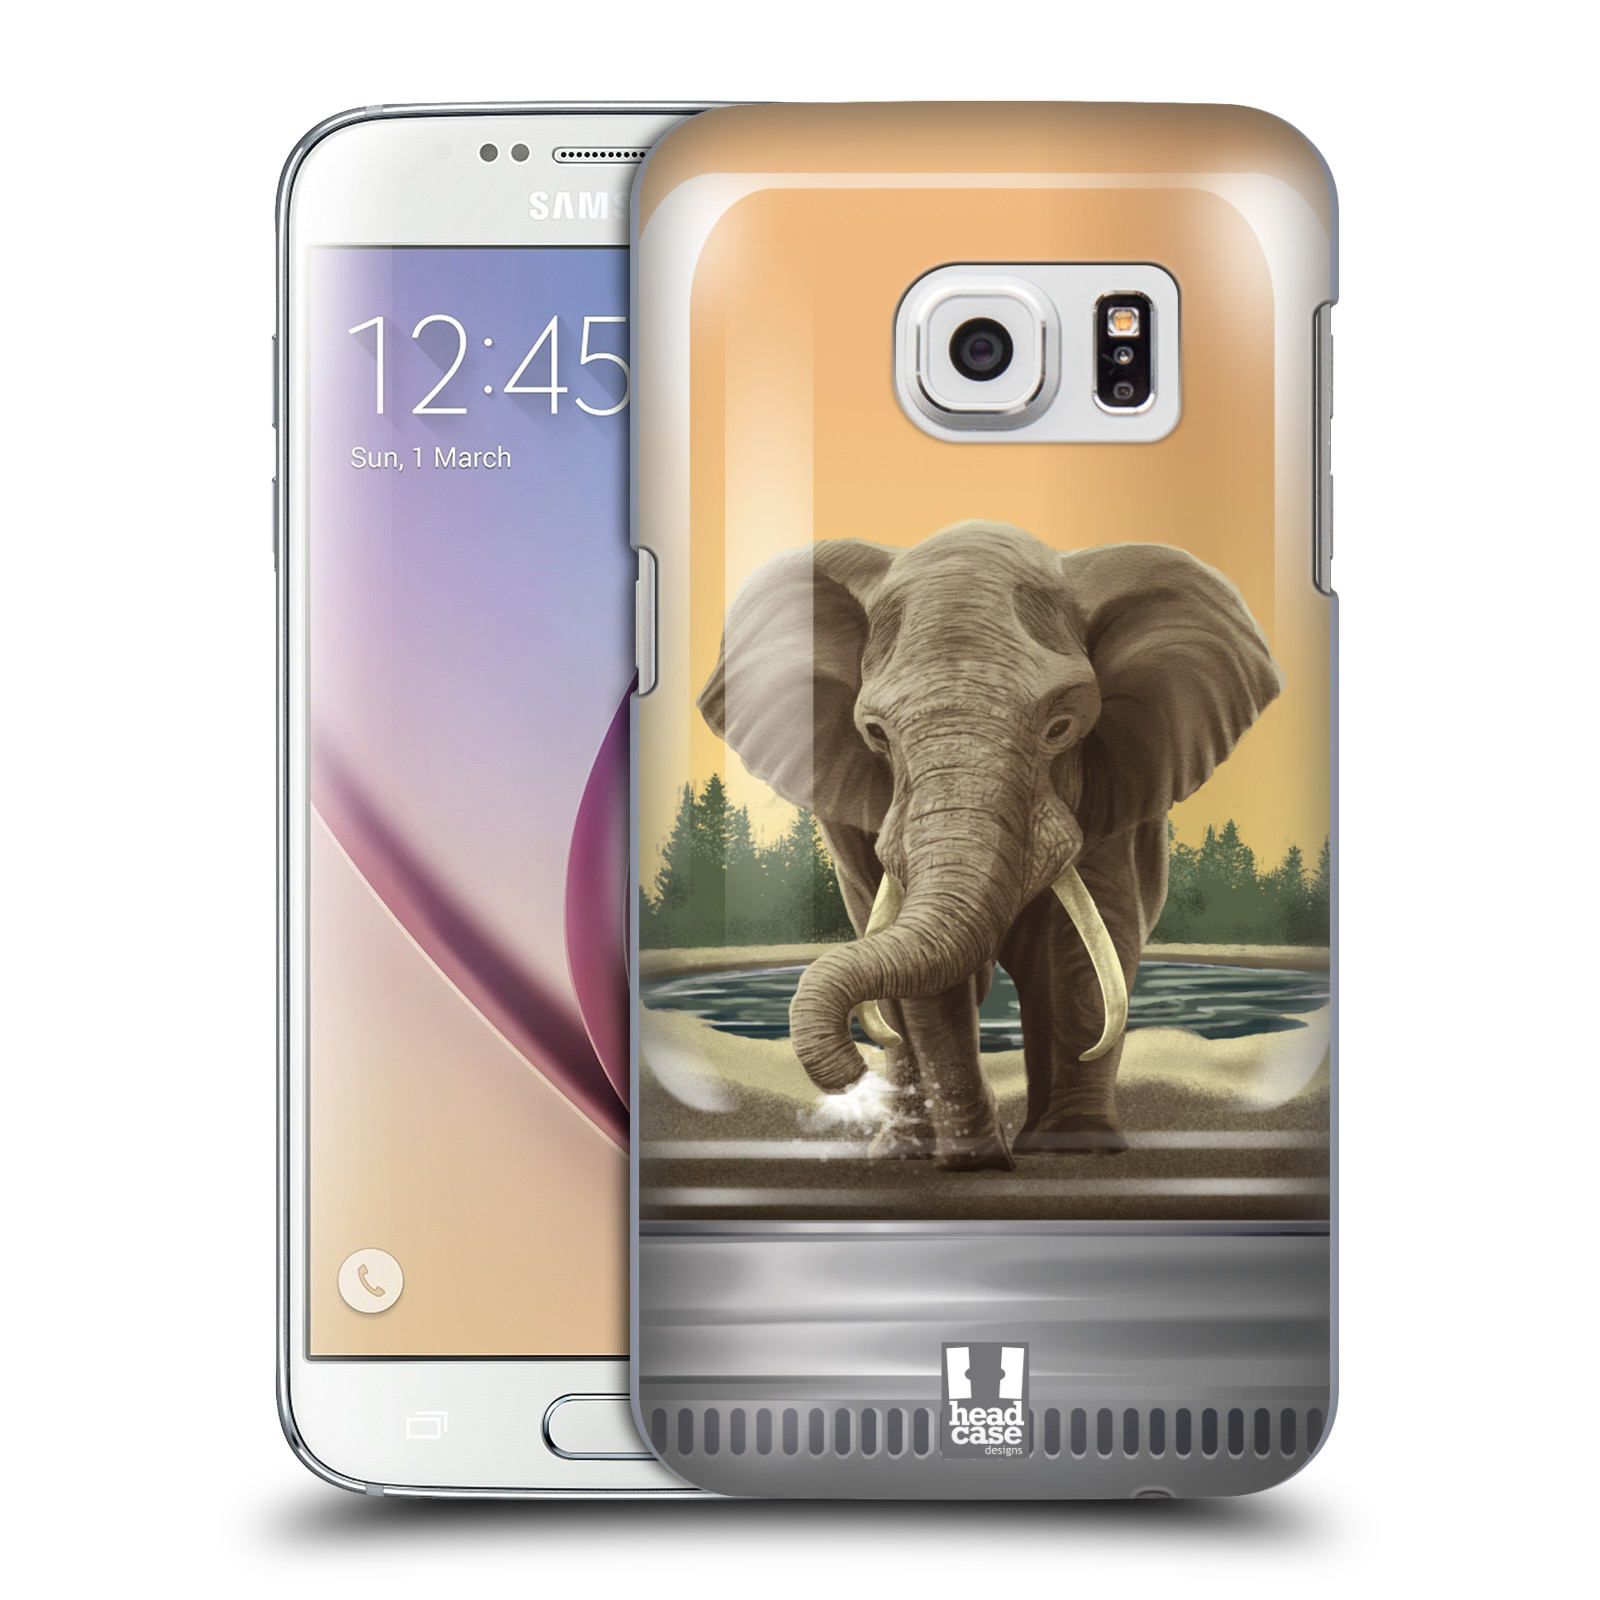 HEAD CASE plastový obal na mobil SAMSUNG GALAXY S7 vzor Zvířátka v těžítku slon